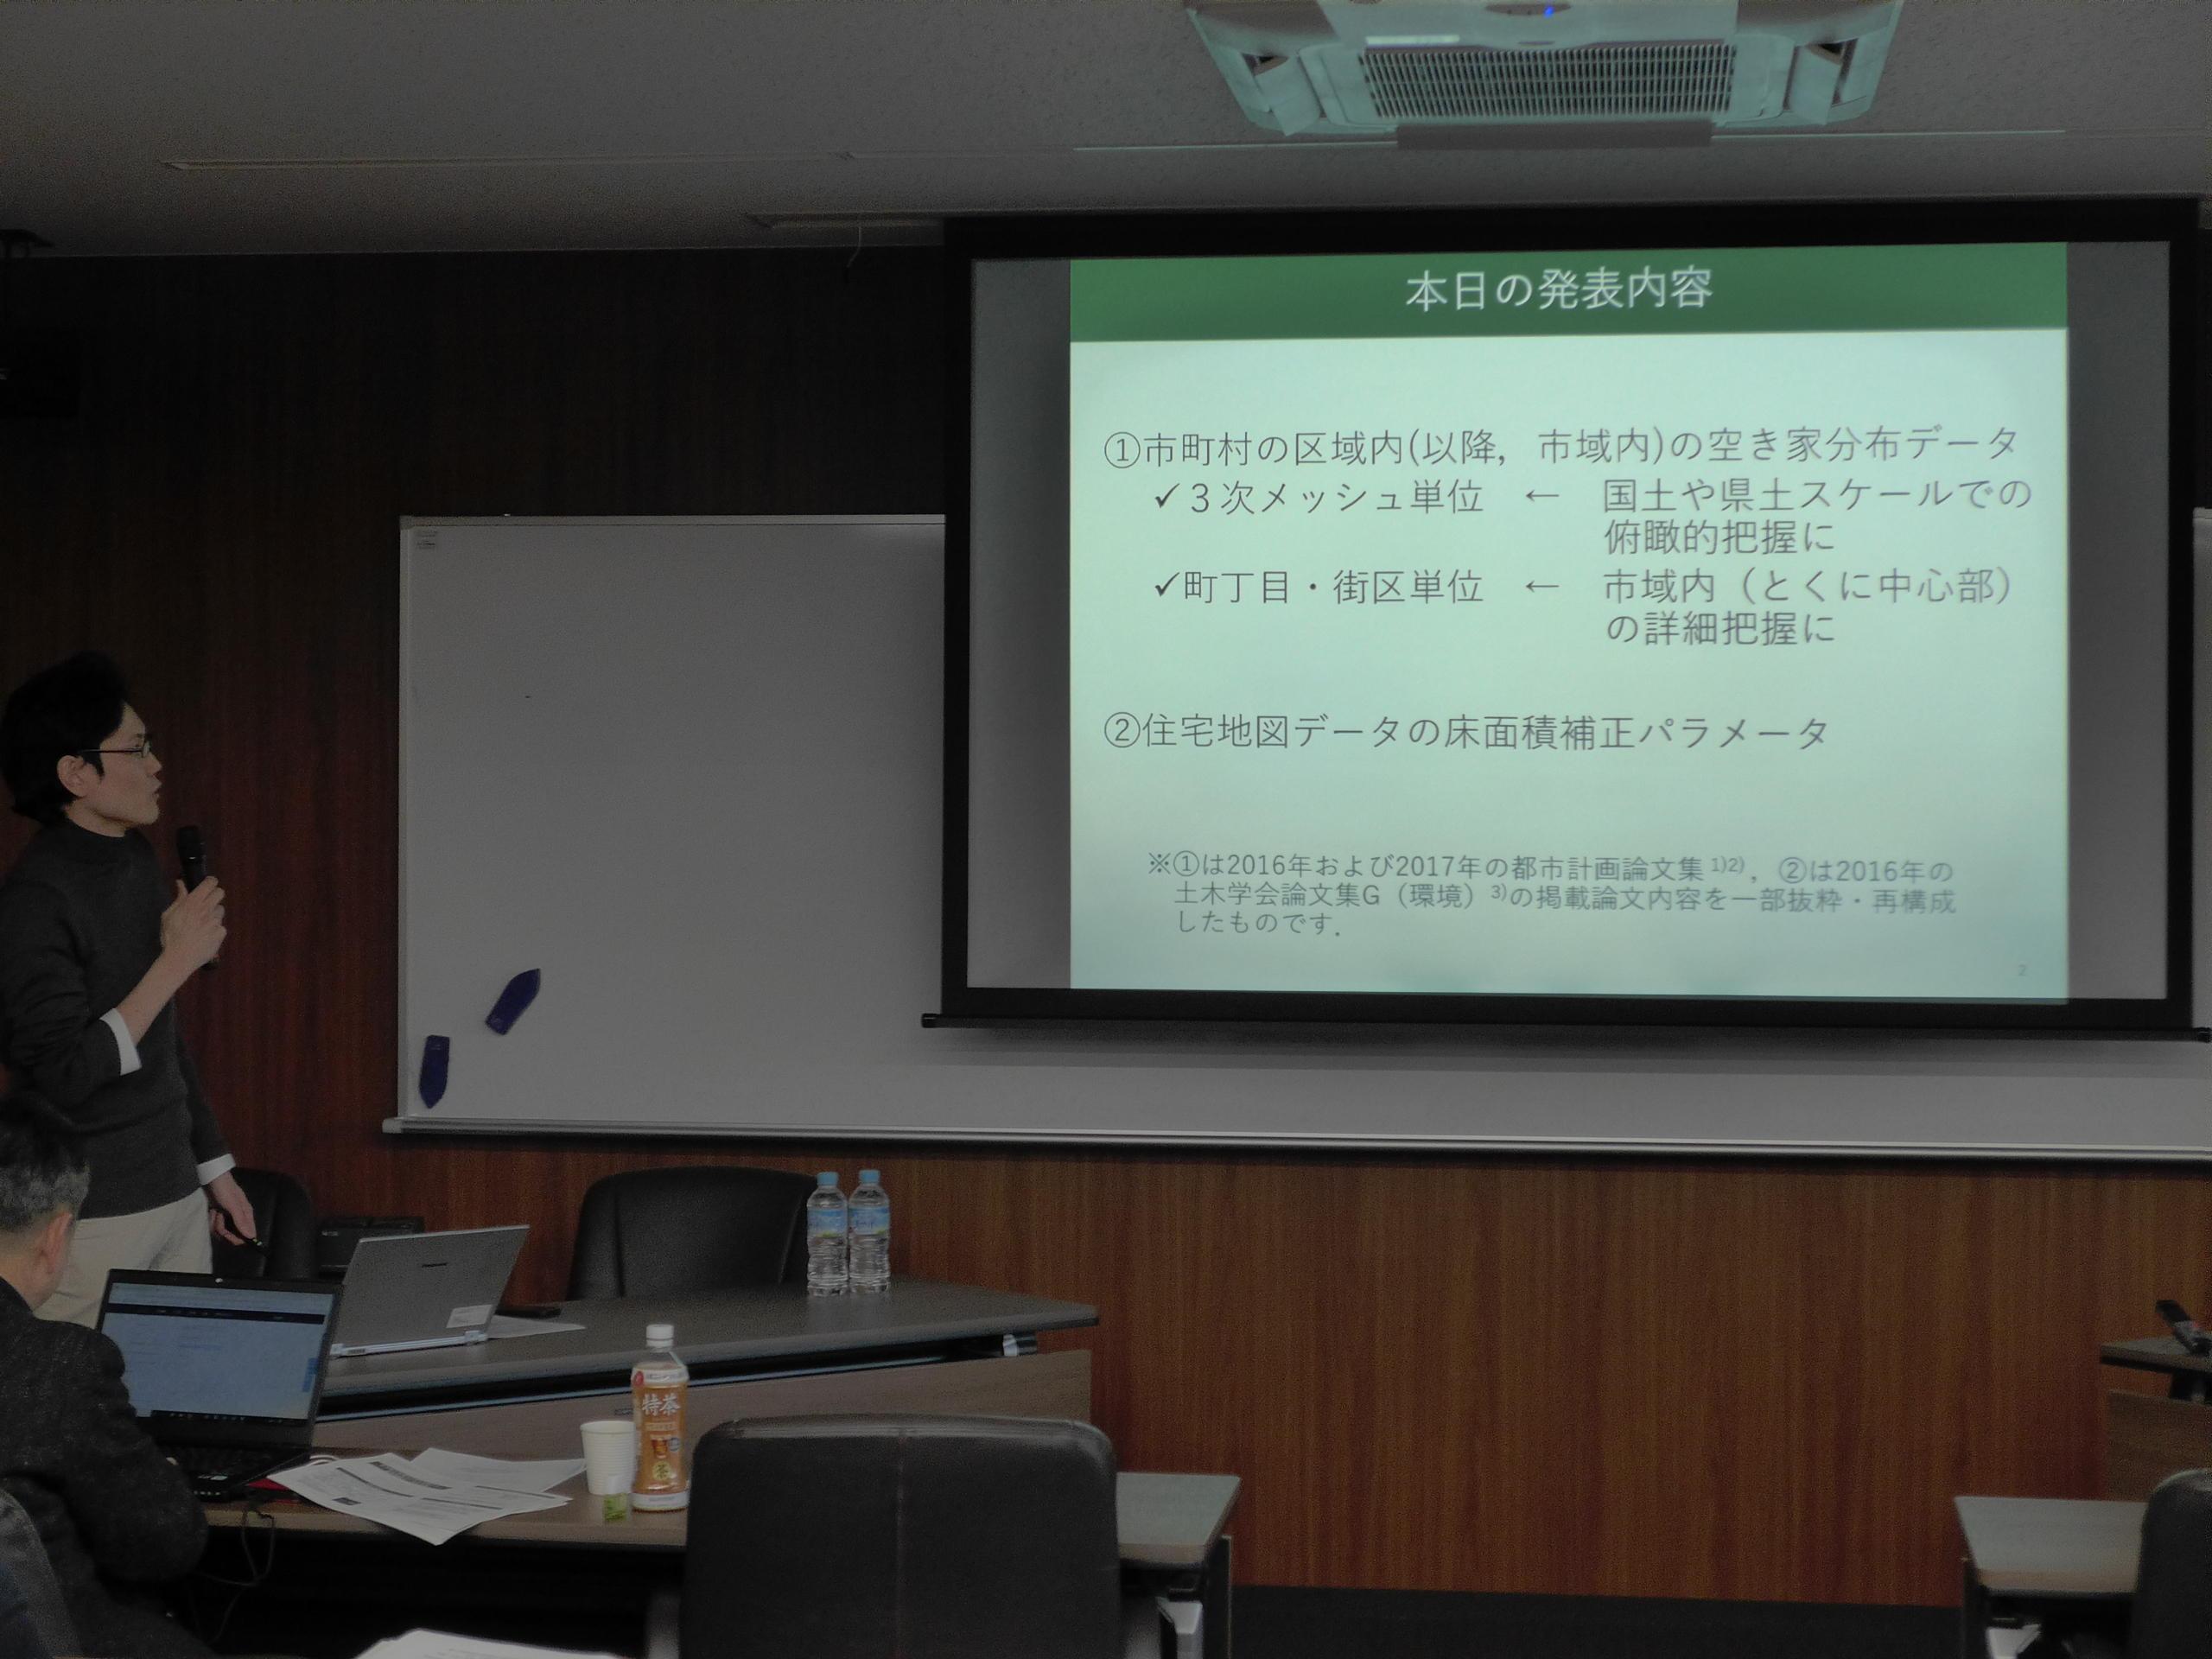 http://rcisss.ier.hit-u.ac.jp/Japanese/micro/information/P1060990.JPG